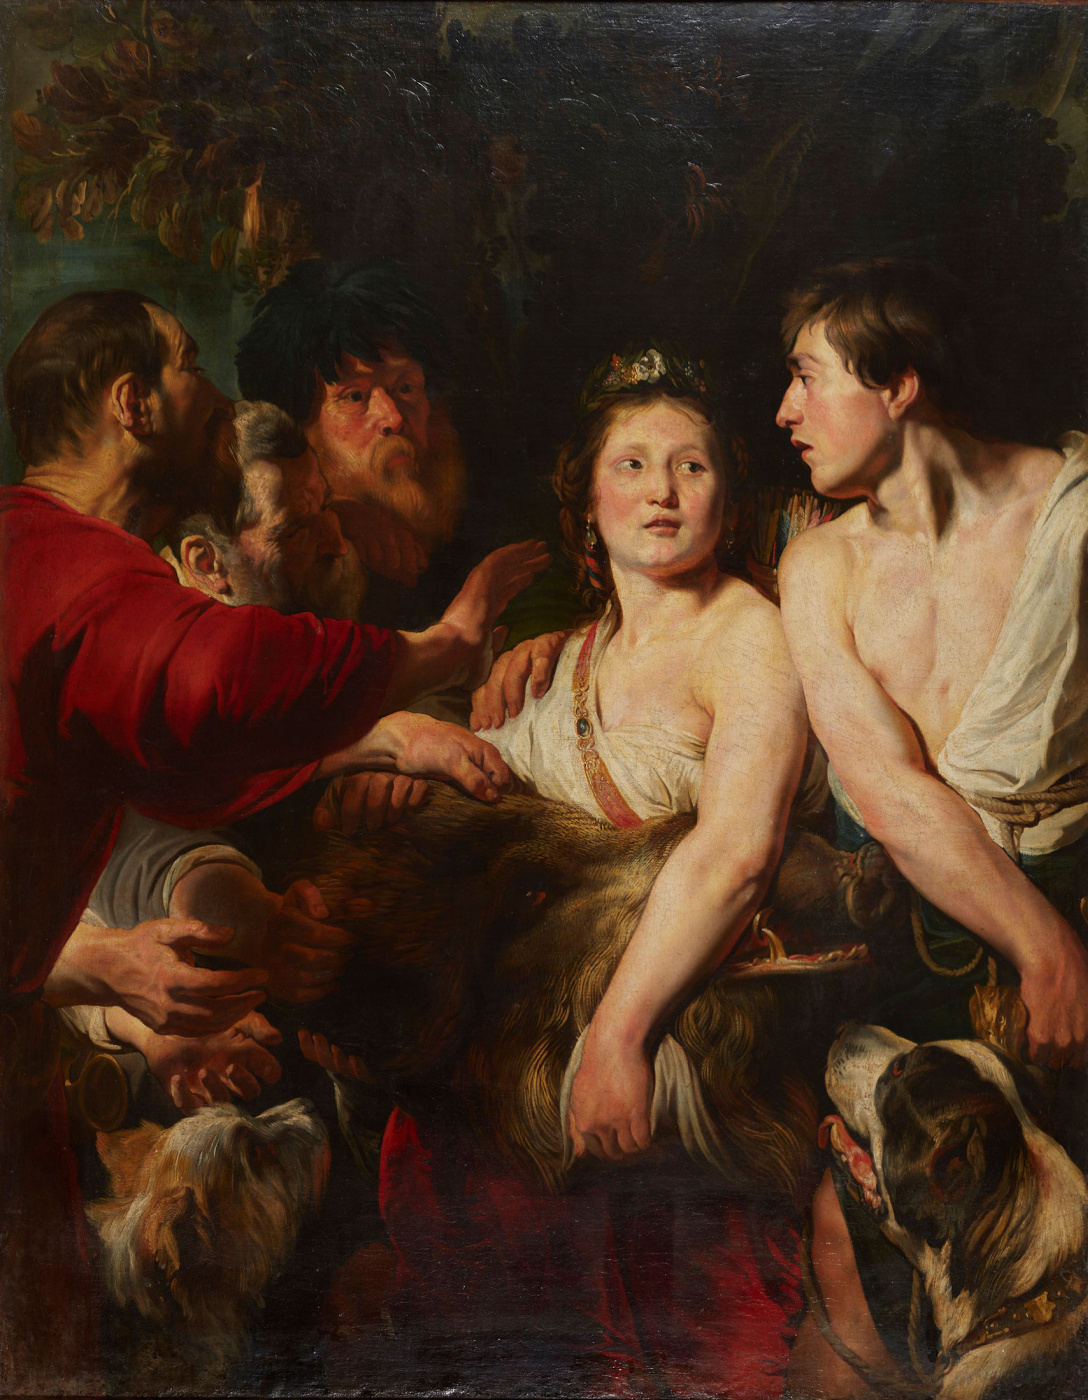 Jacob Jordaens. Meleager and Atalanta